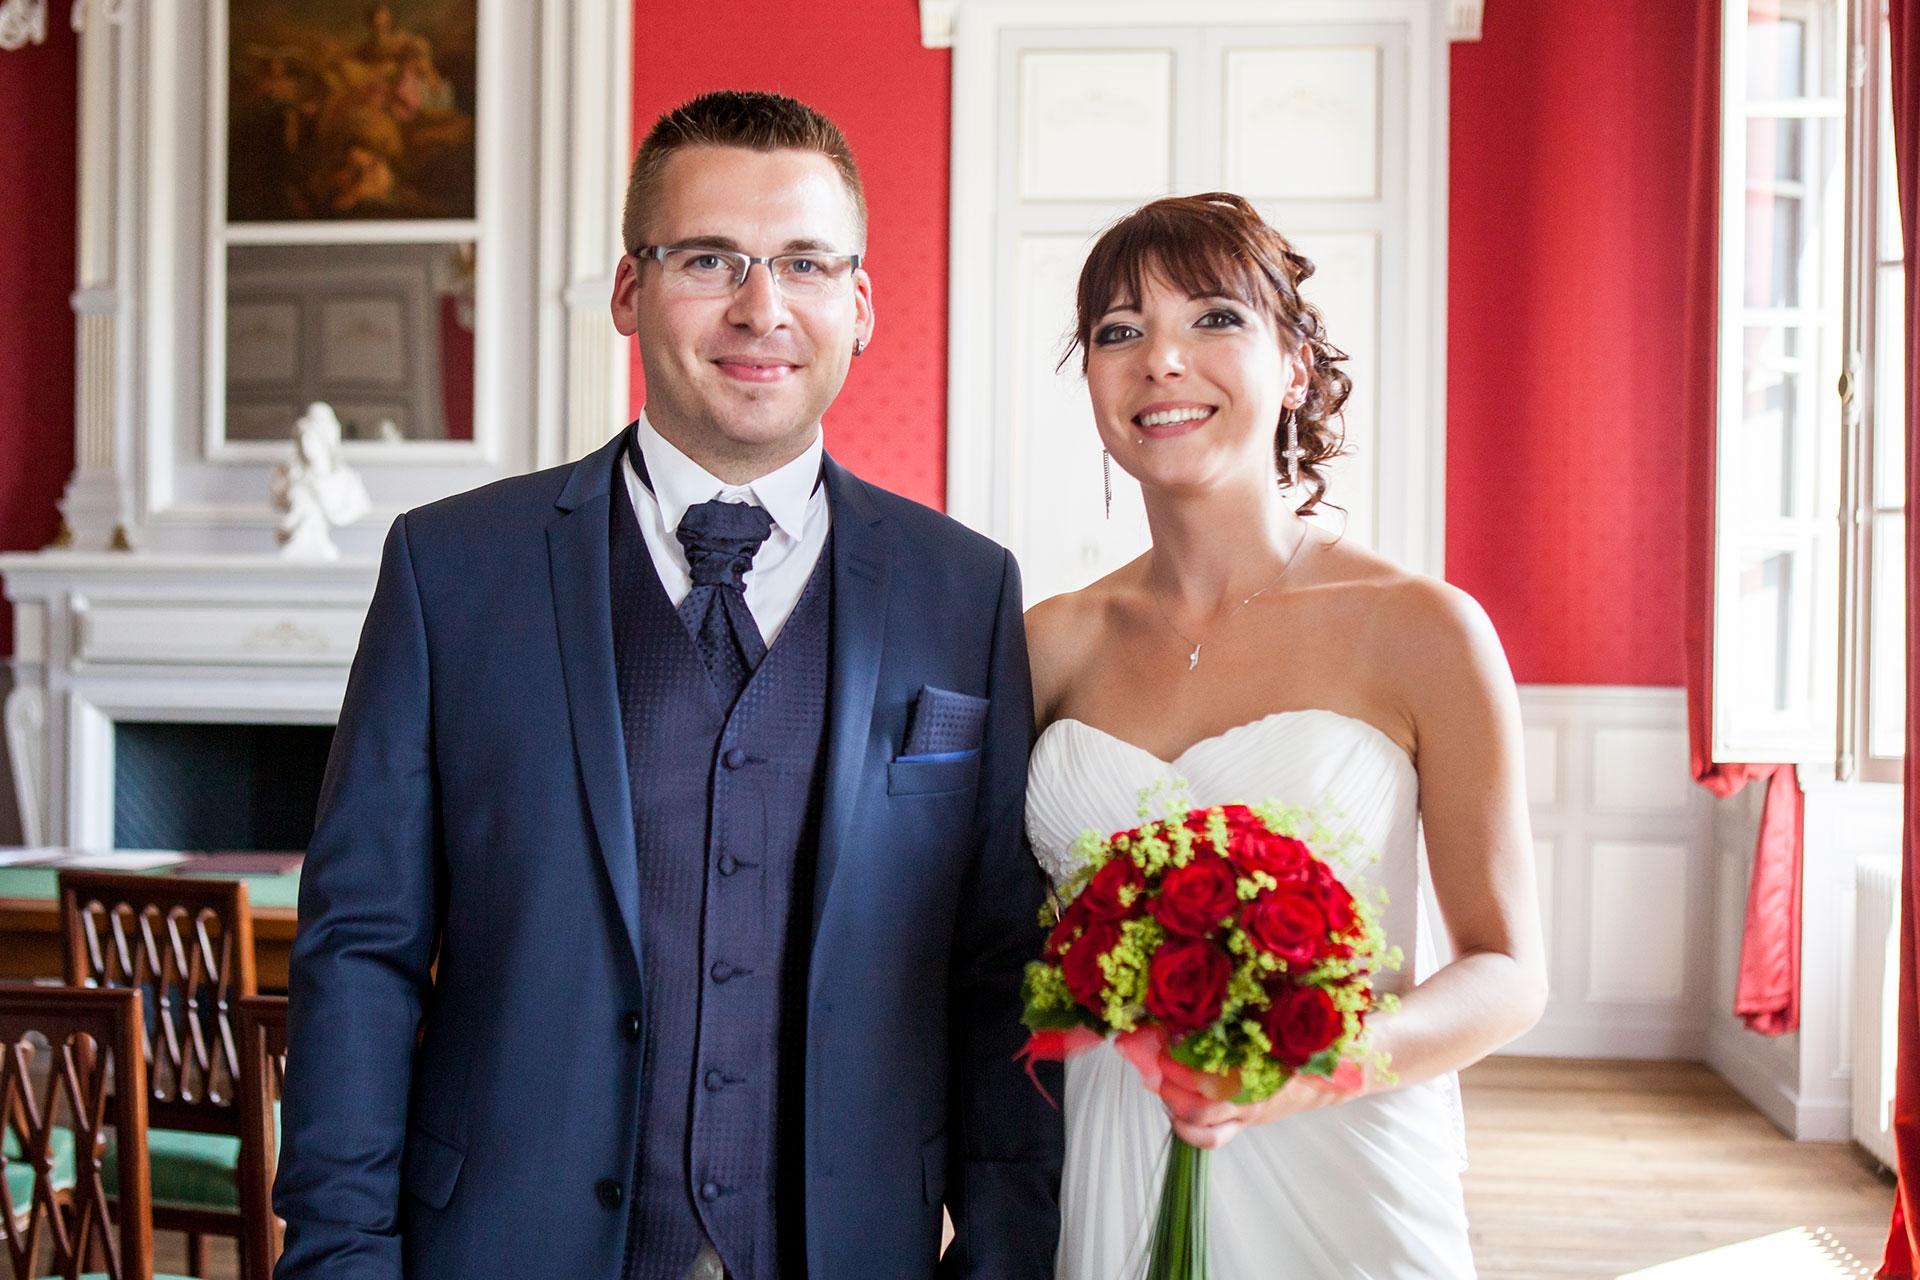 particuliers-evenements-mariages-oui-aurelie&geoffrey-06